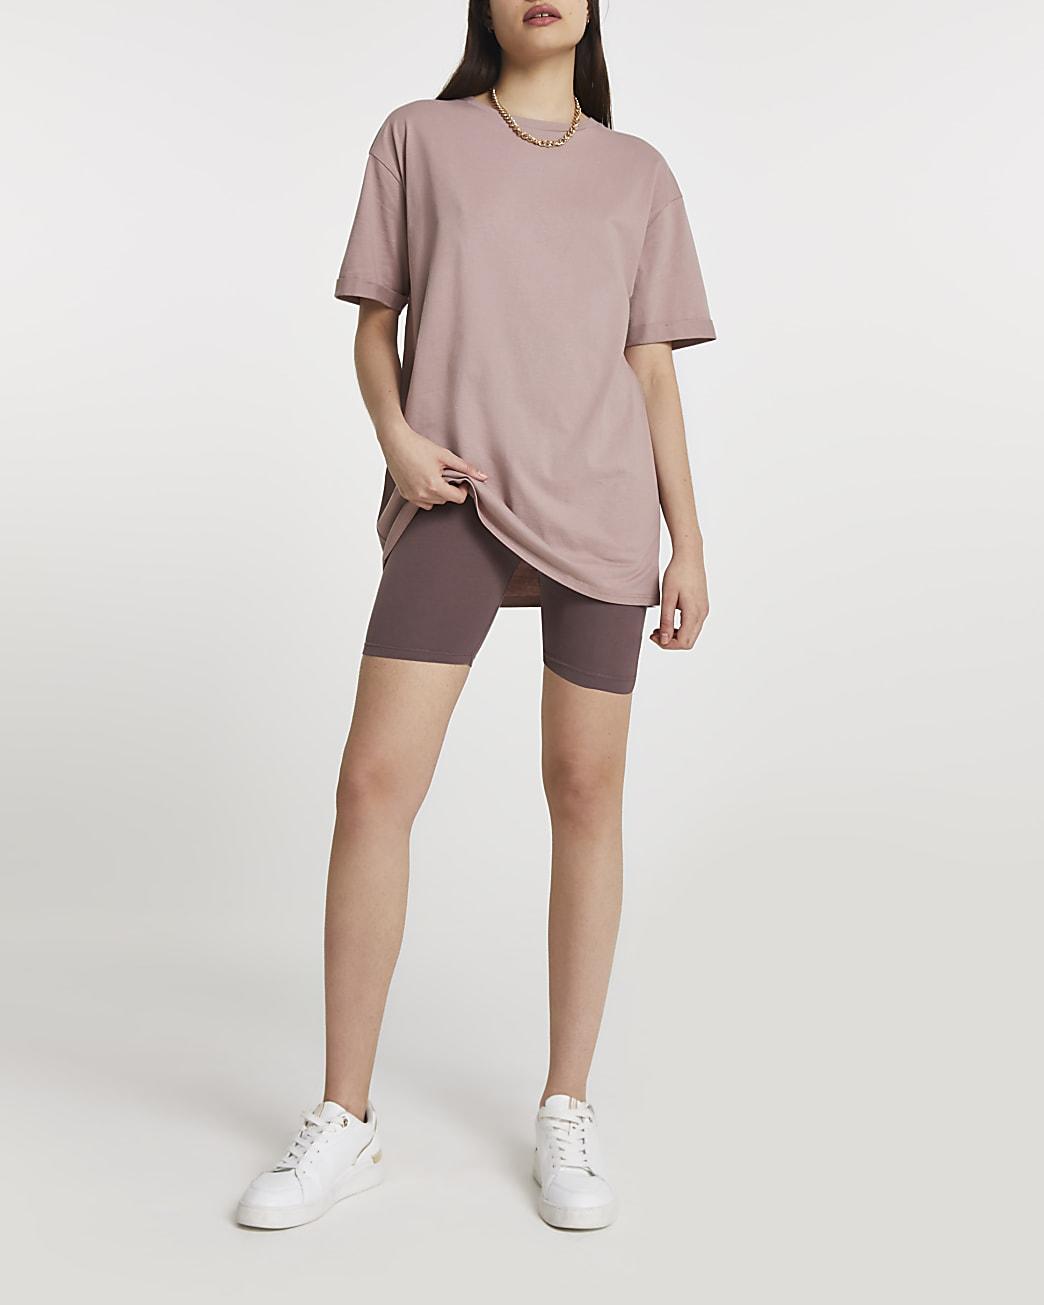 Beige short sleeve boyfriend t-shirt